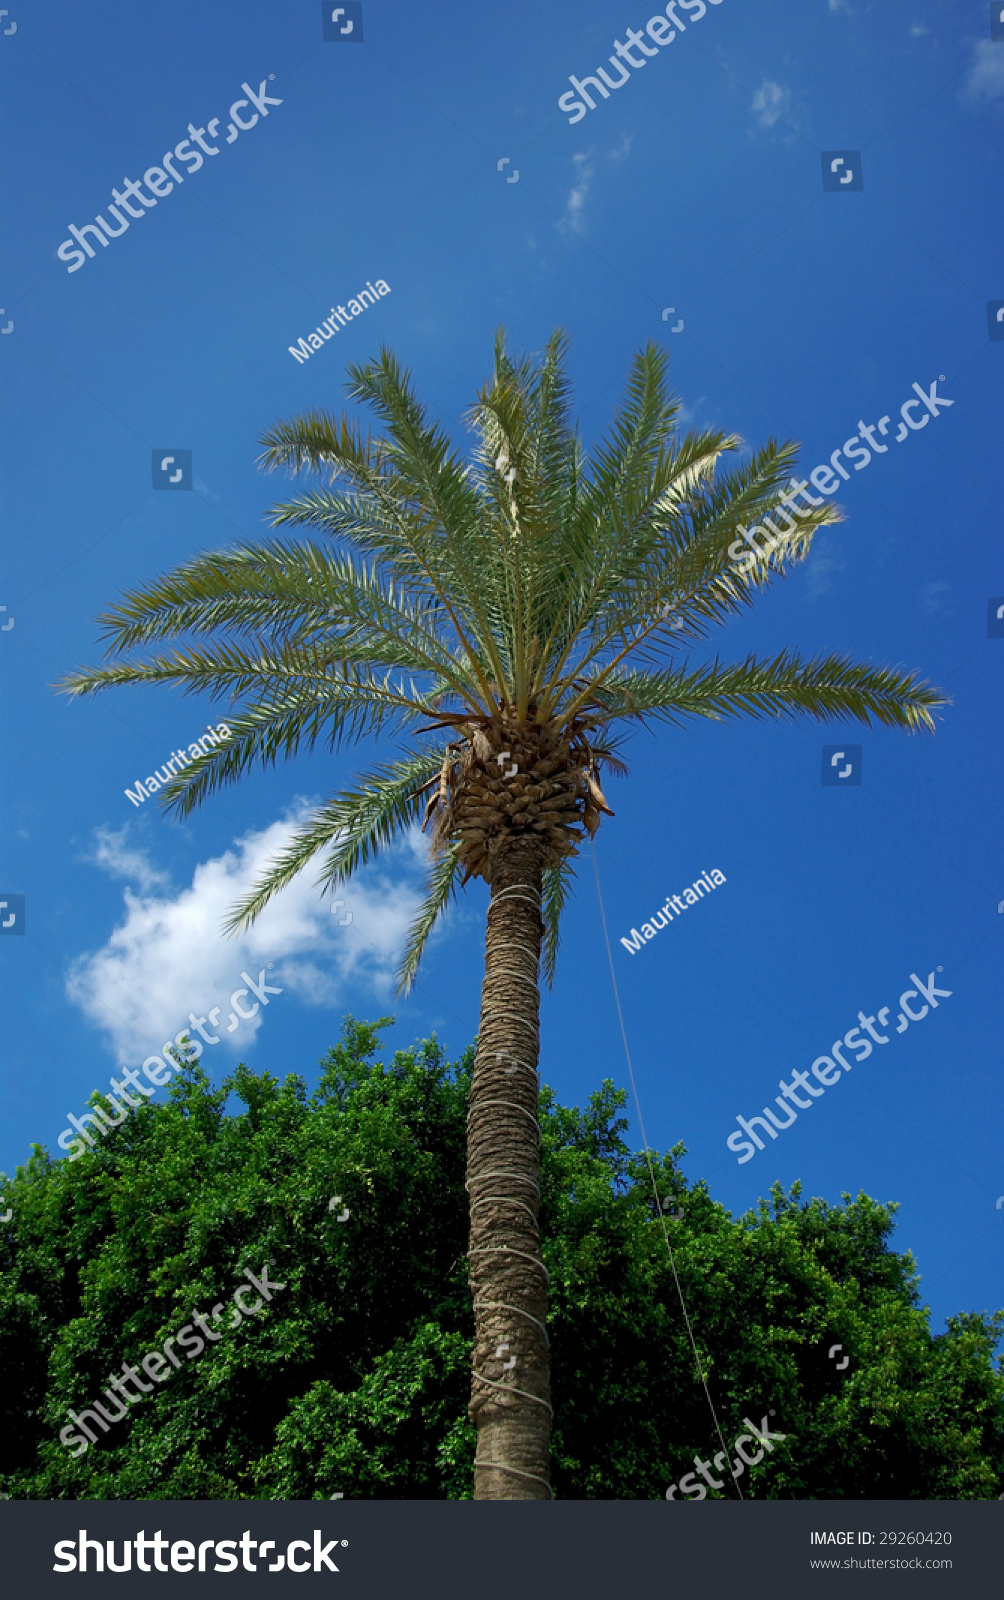 trees palm blue - photo #48